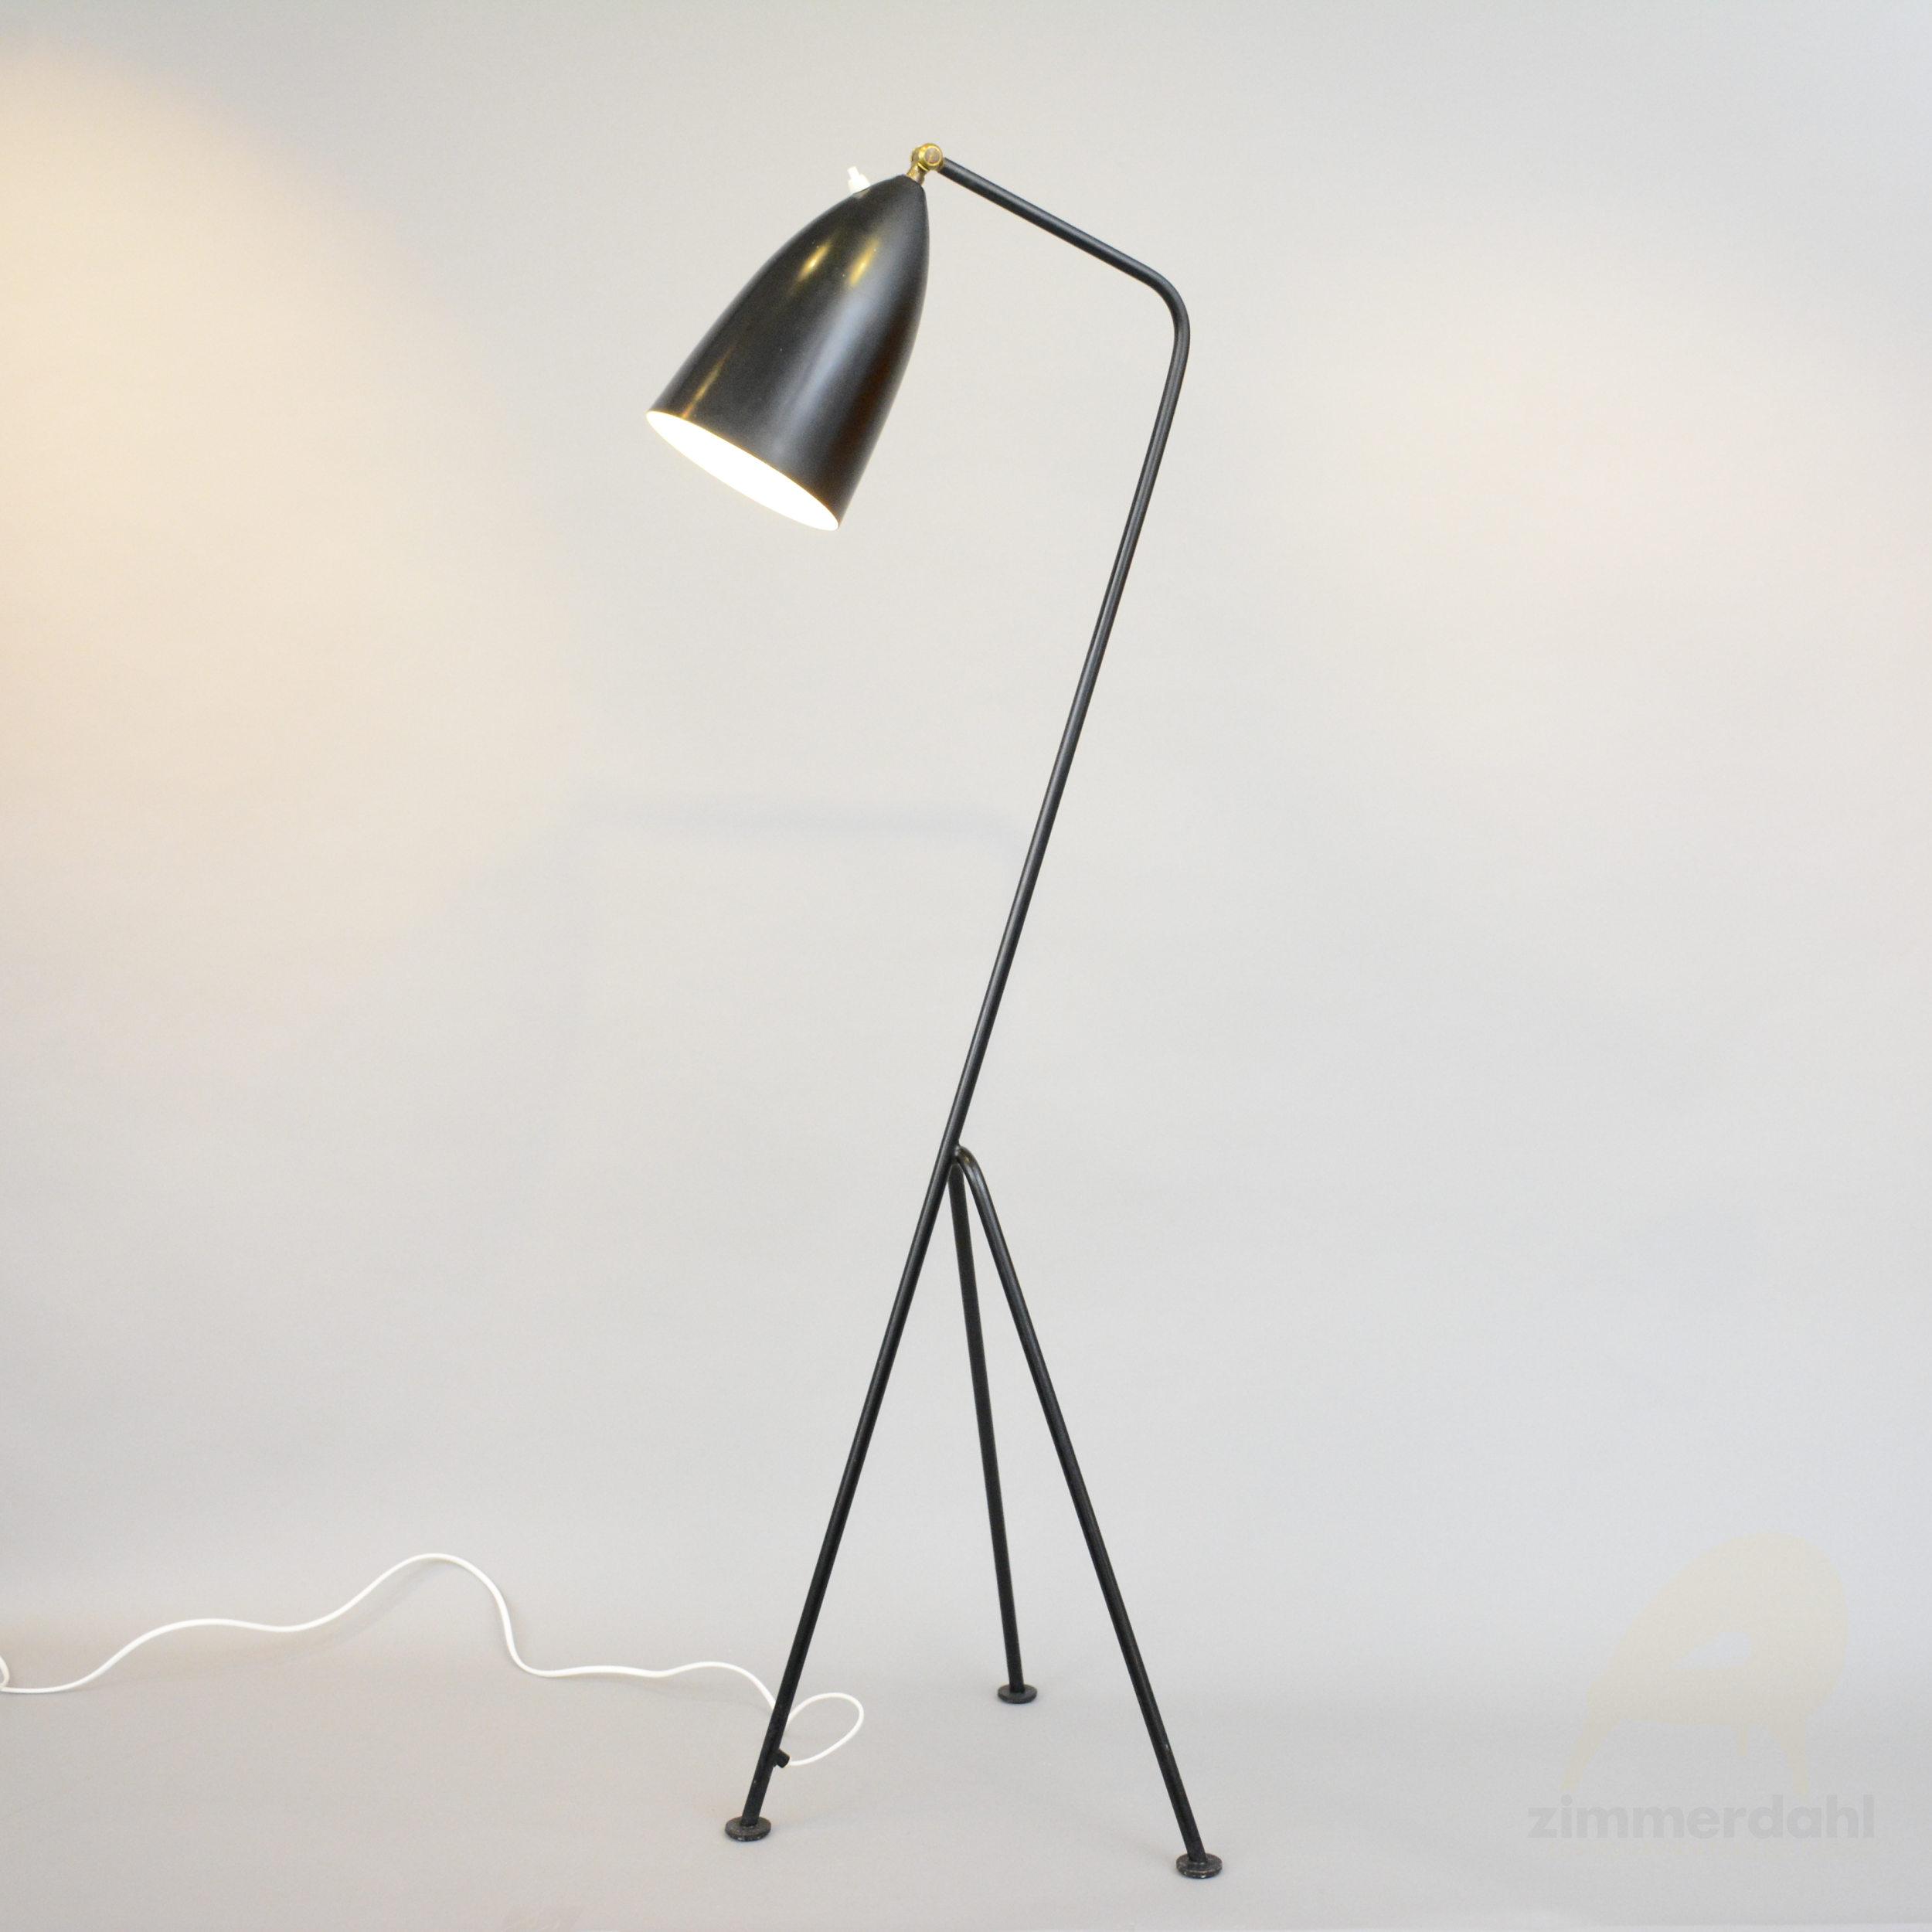 Floor Lamp Grasshopper By Greta Magnusson Grossman For Bergboms Sweden Scandinavian Timeless Design Zimmerdahl Antiques Design Ab